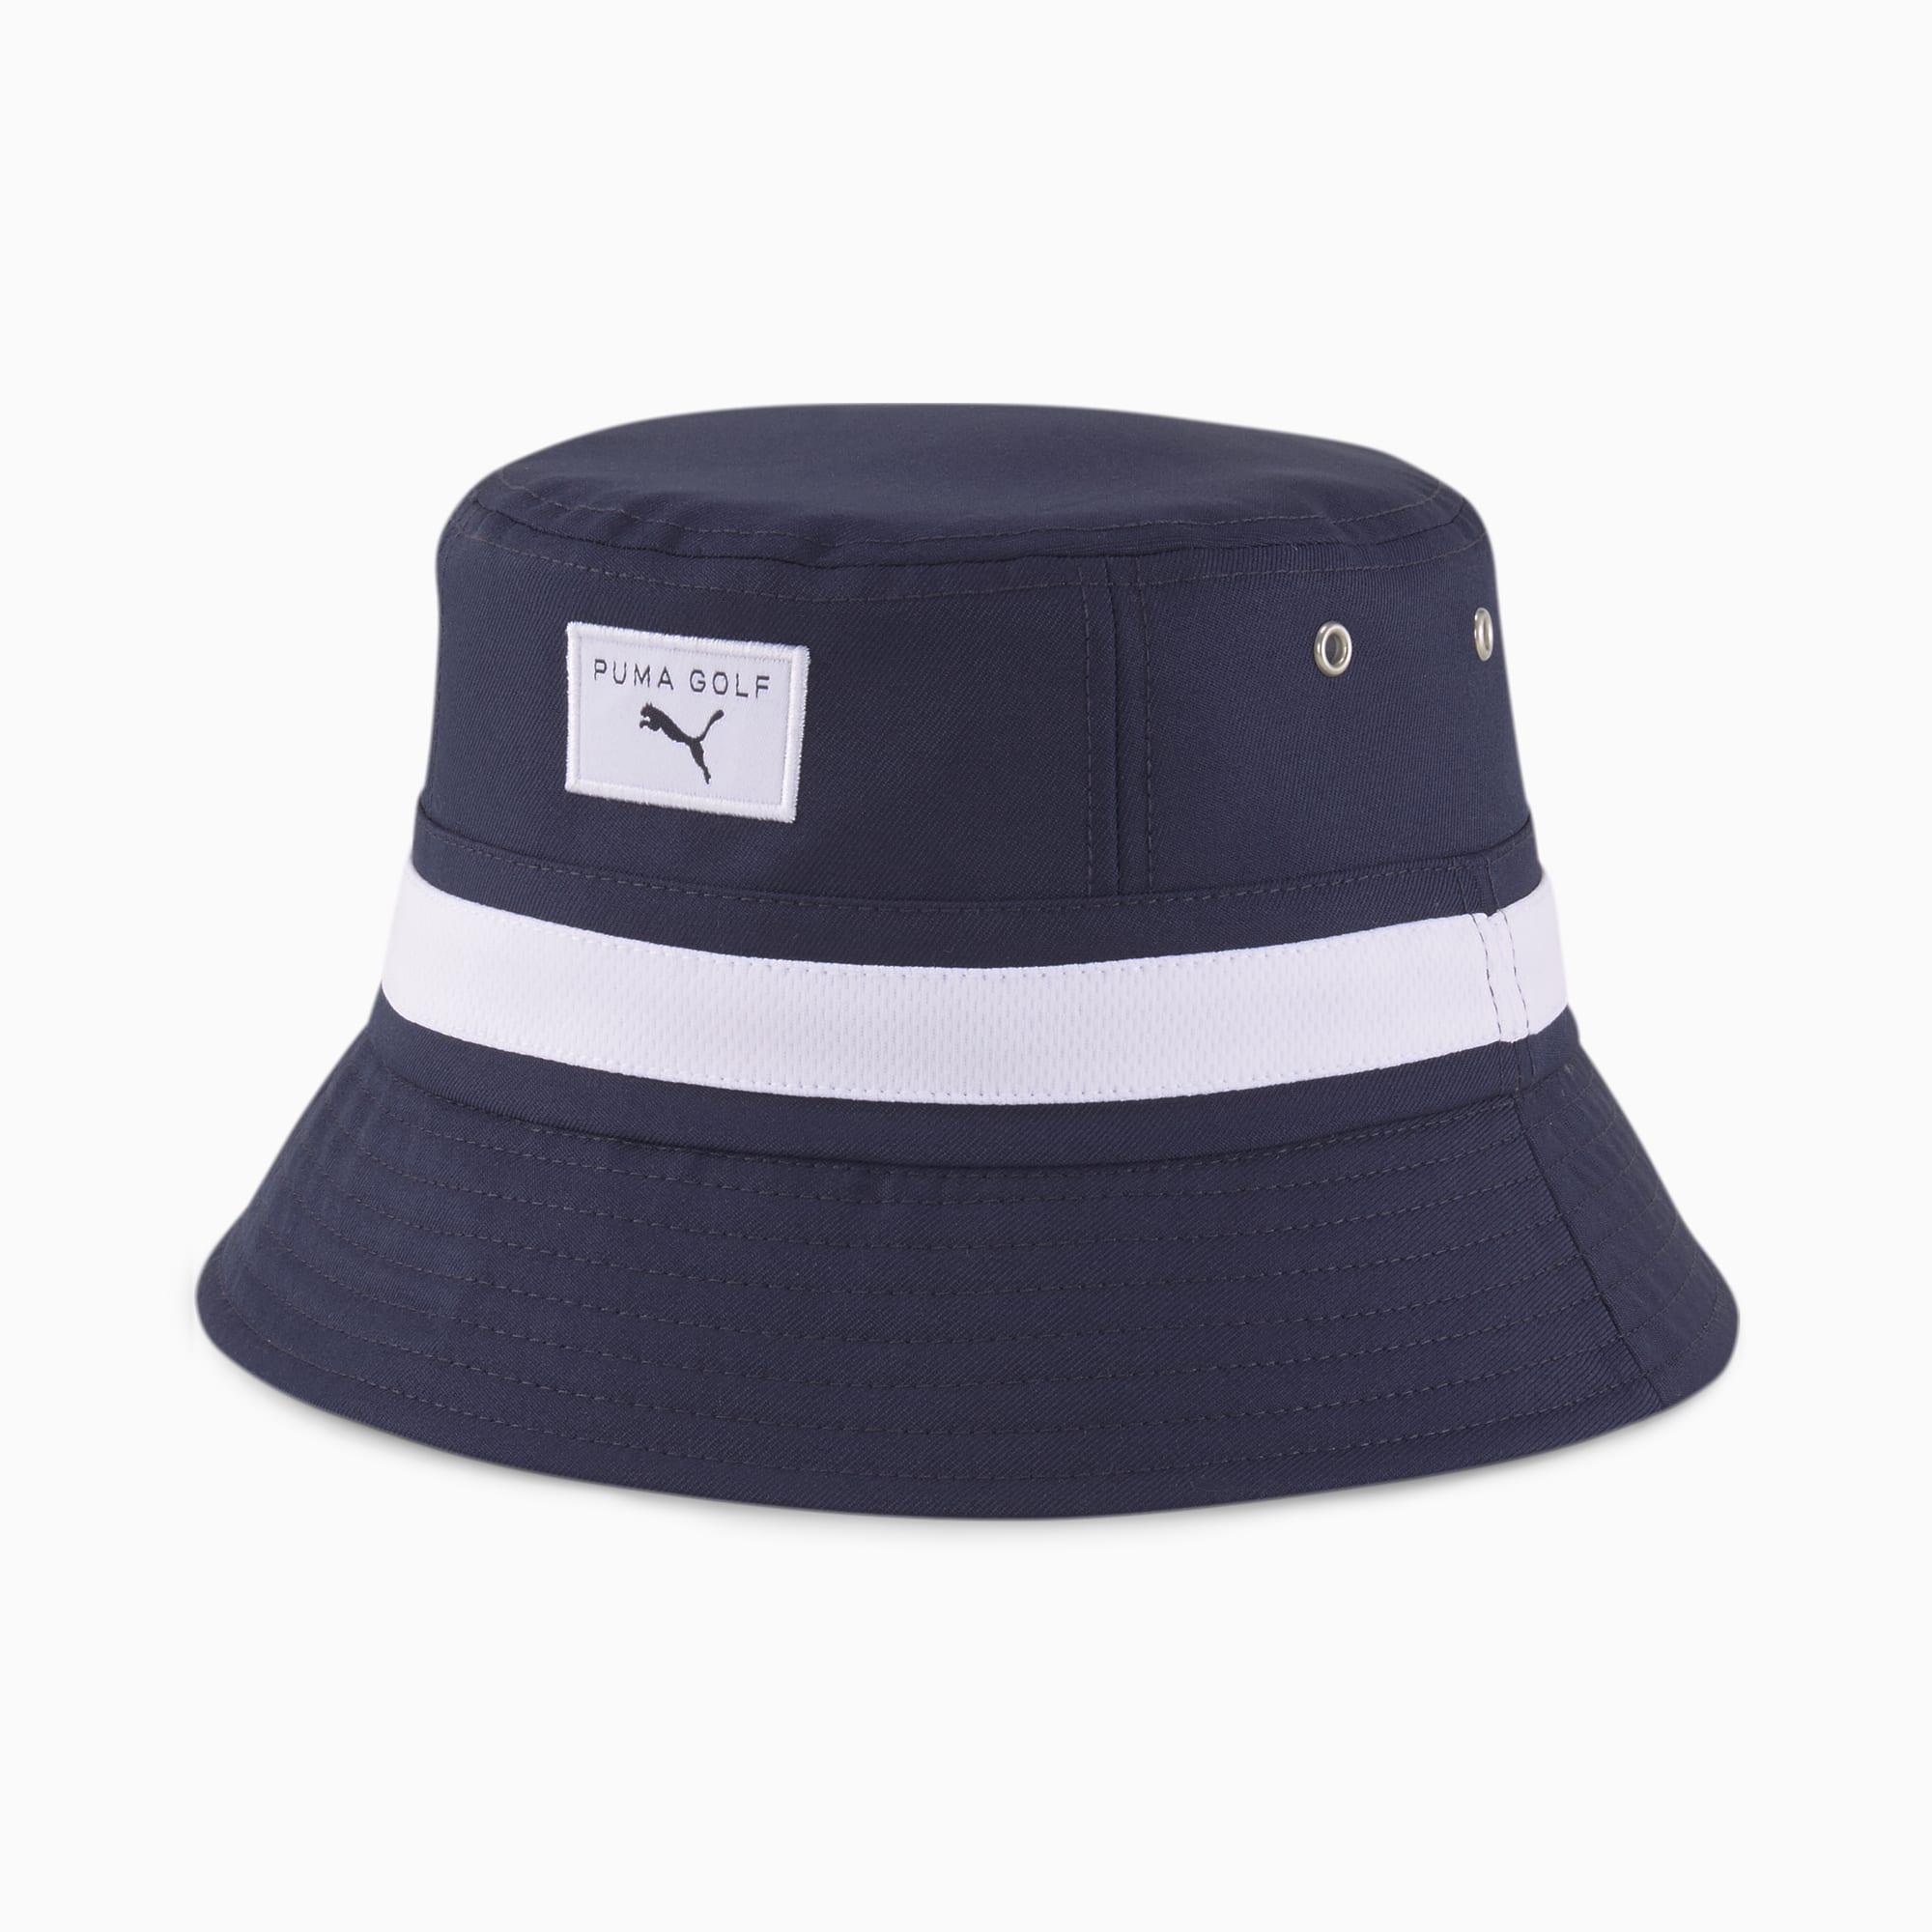 Bob de golf Williams , Bleu, Taille L/XL, Accessoires - PUMA - Modalova